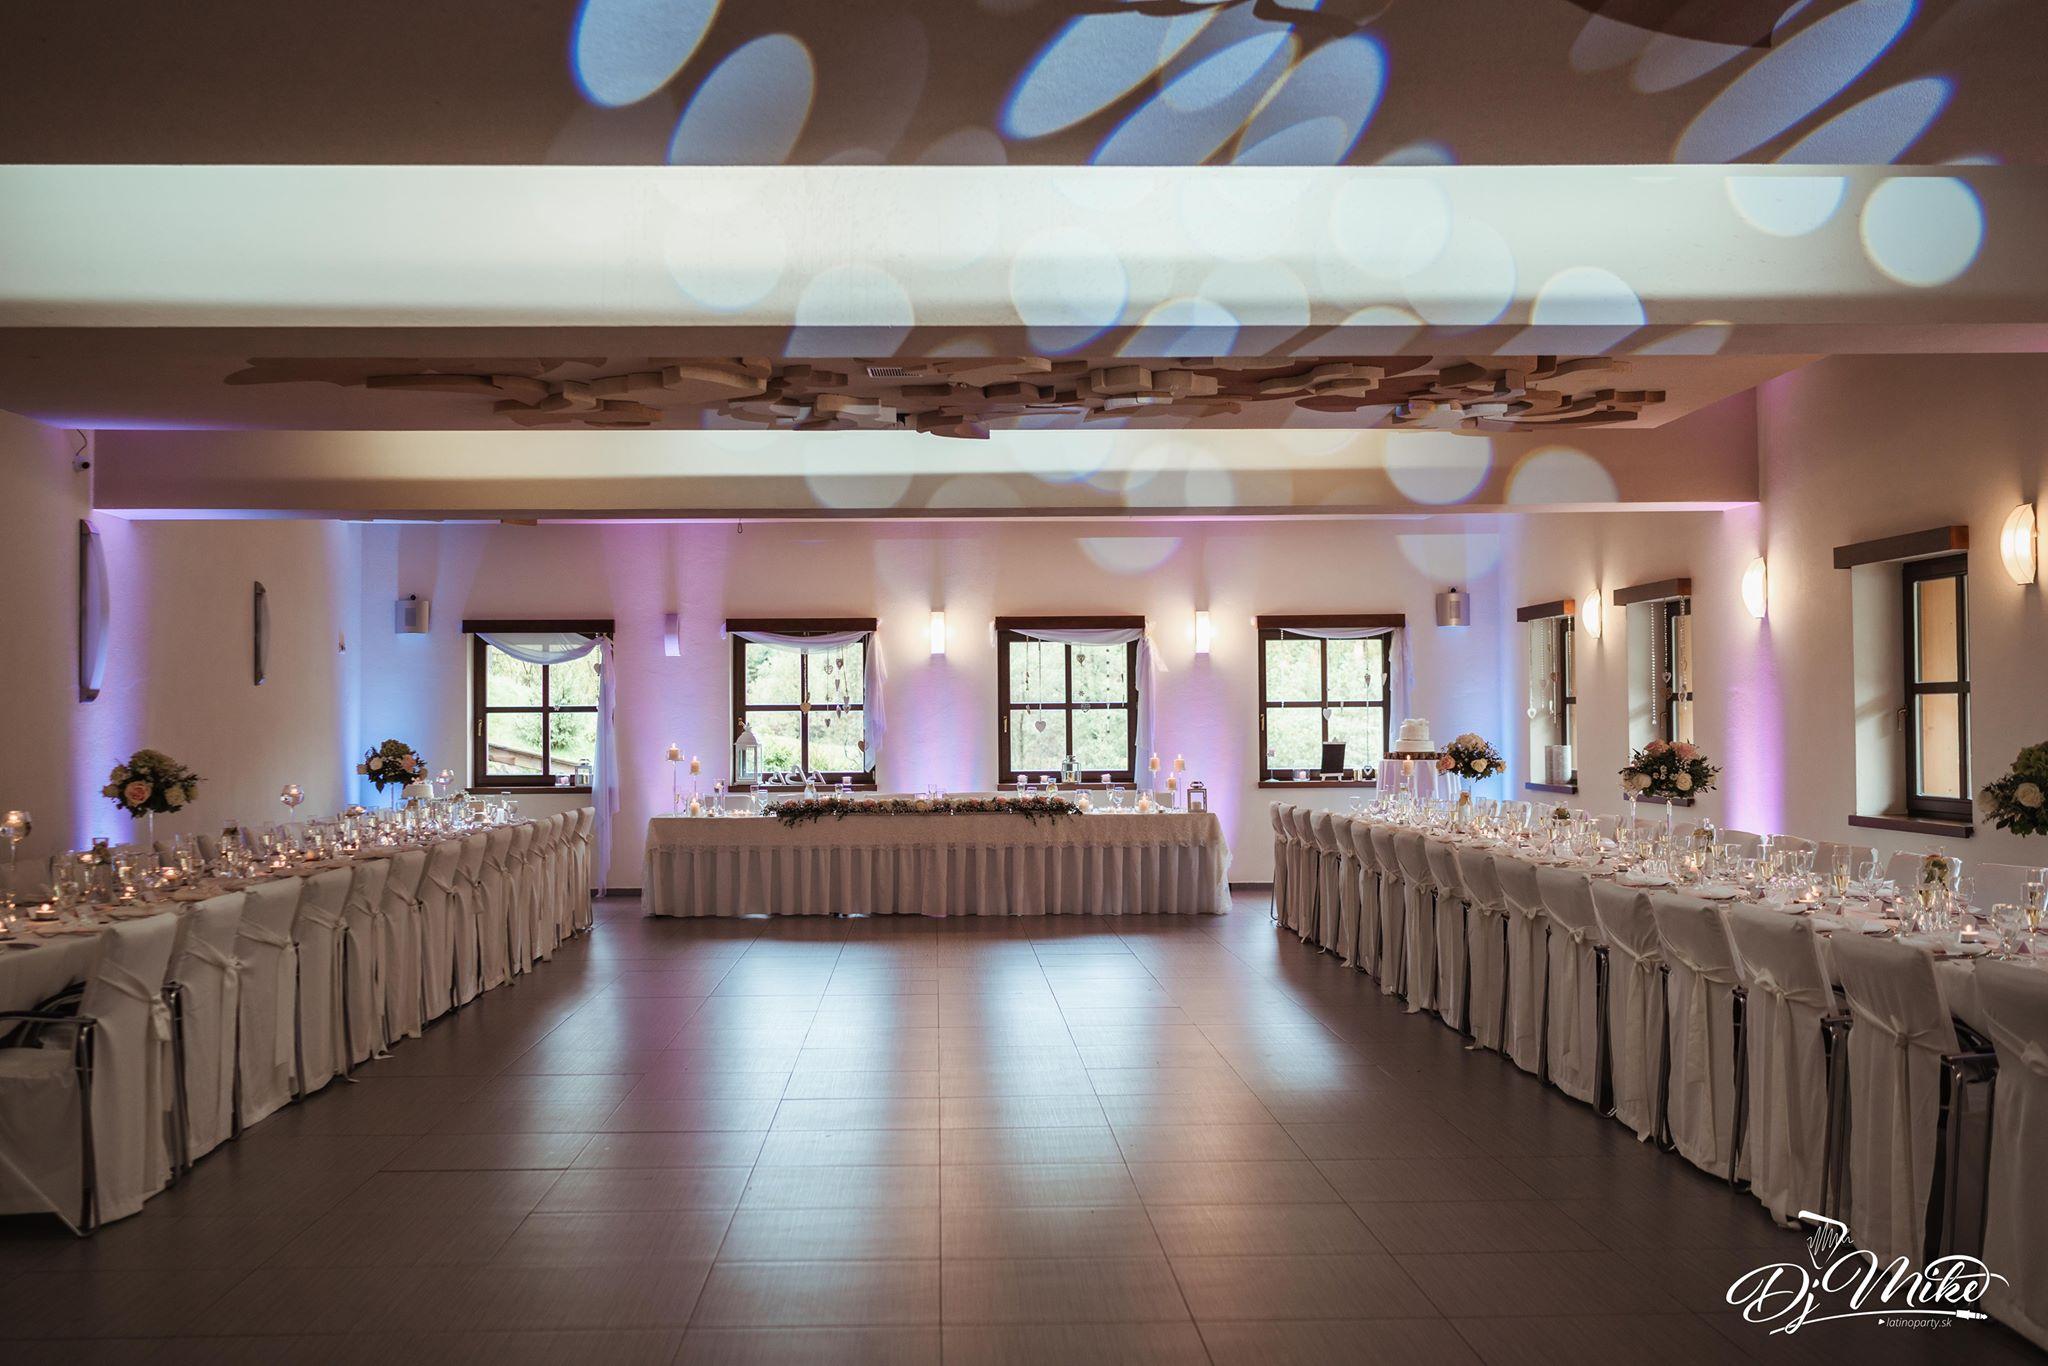 svadba-koliba-osvetlenia-nasvietenie-saly-dj-mikejpg